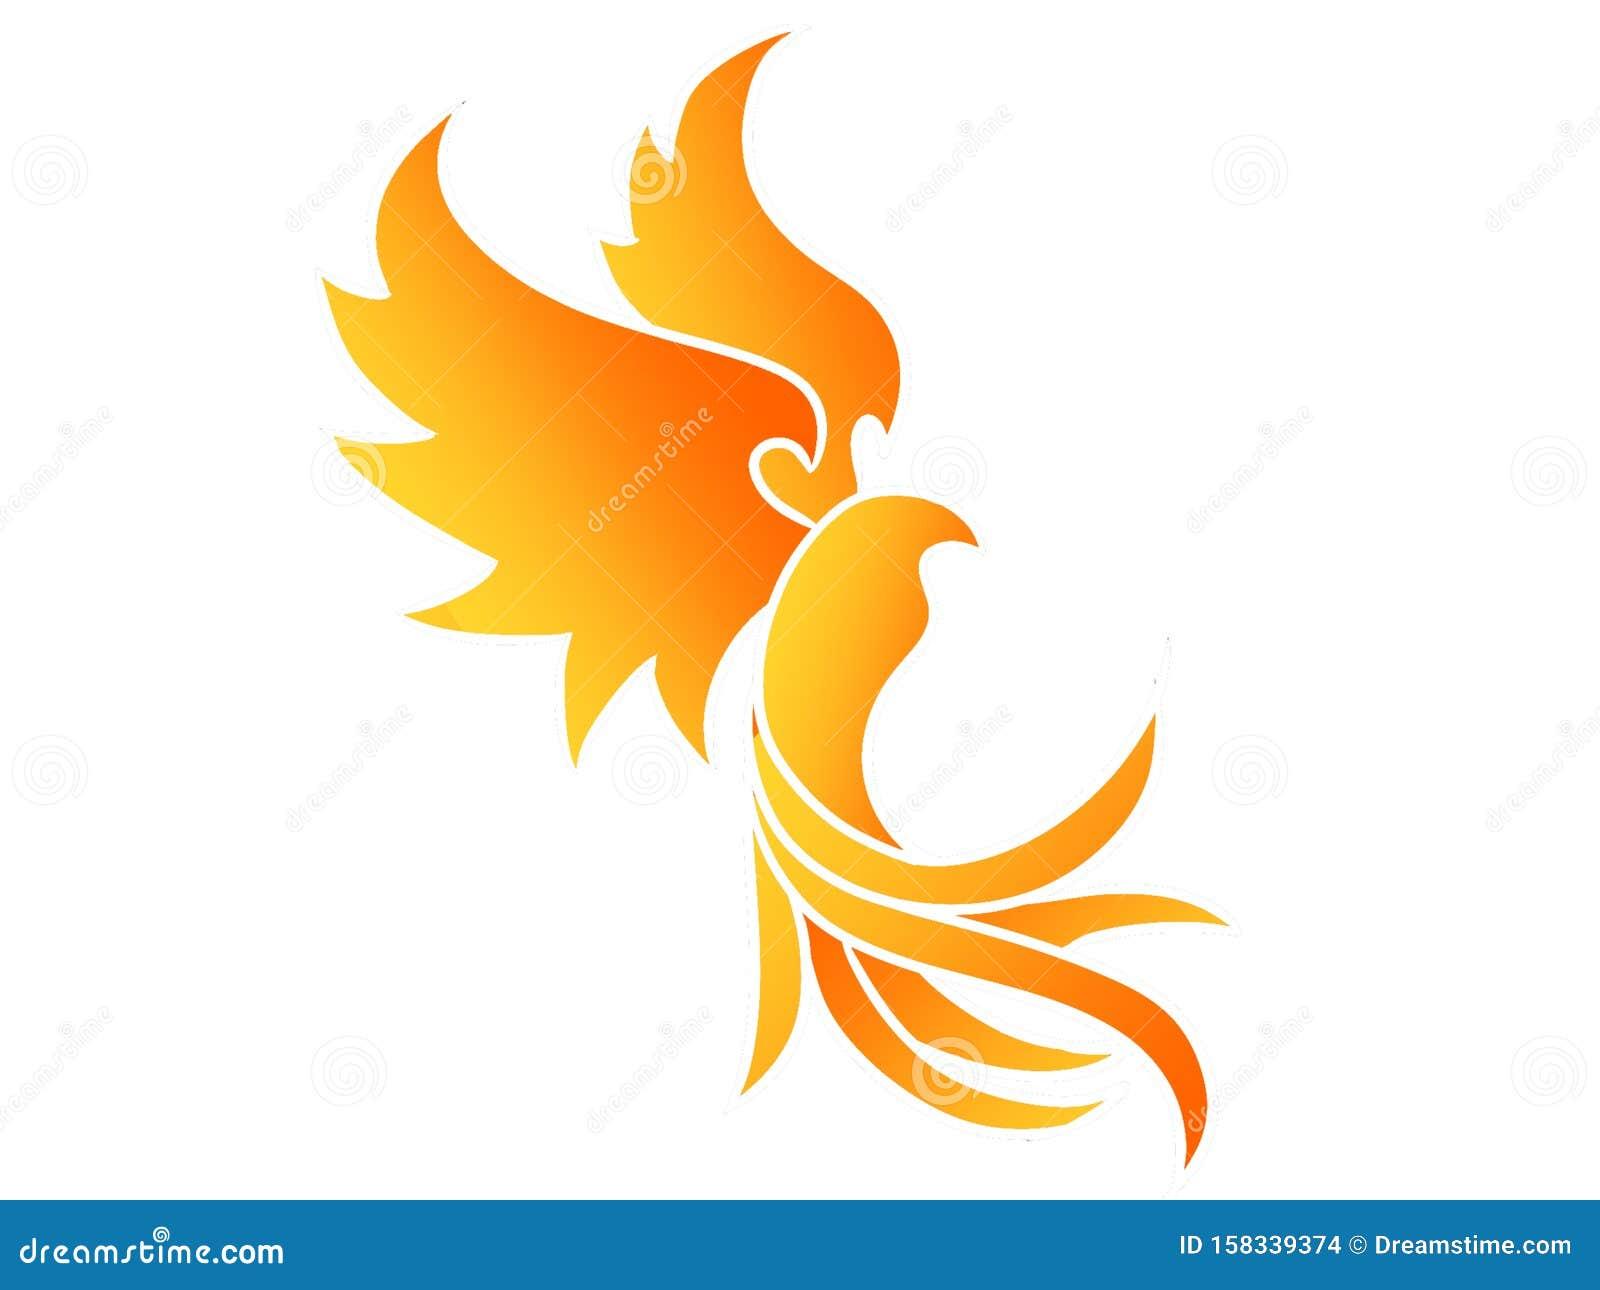 12 Phoenix Bird Logo Photos Free Royalty Free Stock Photos From Dreamstime